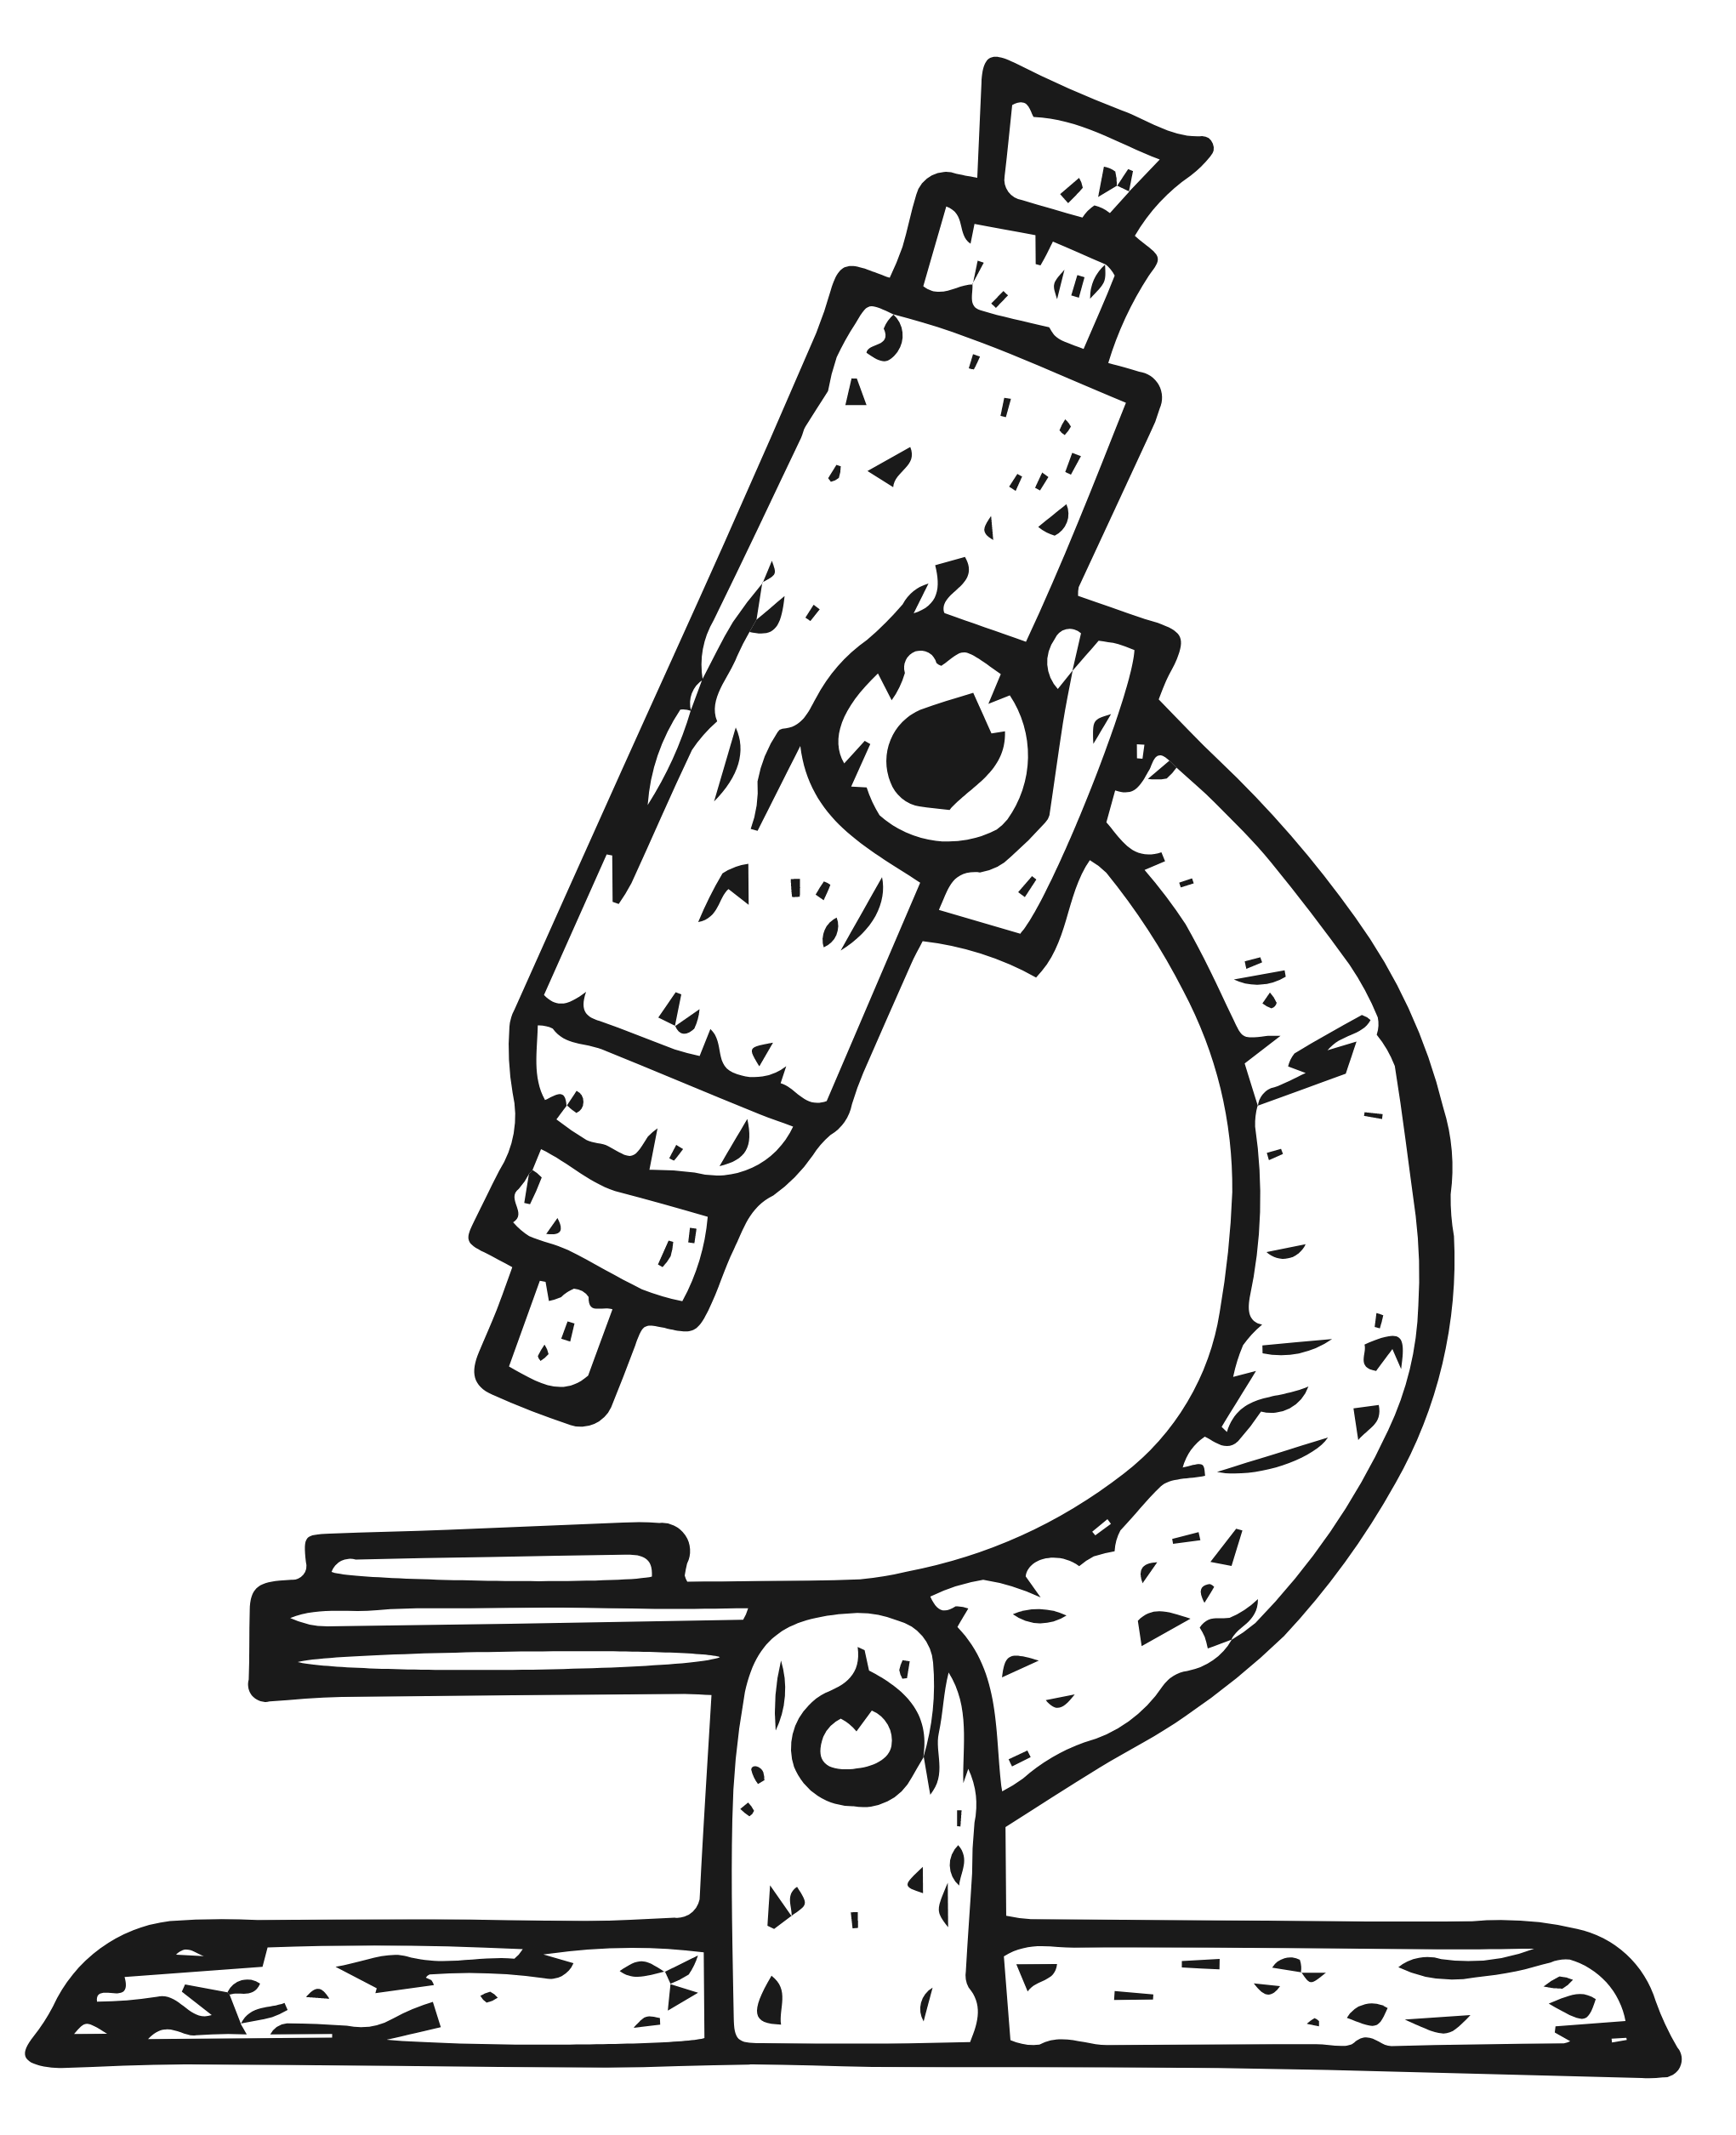 noun_Microscope_2695607.png